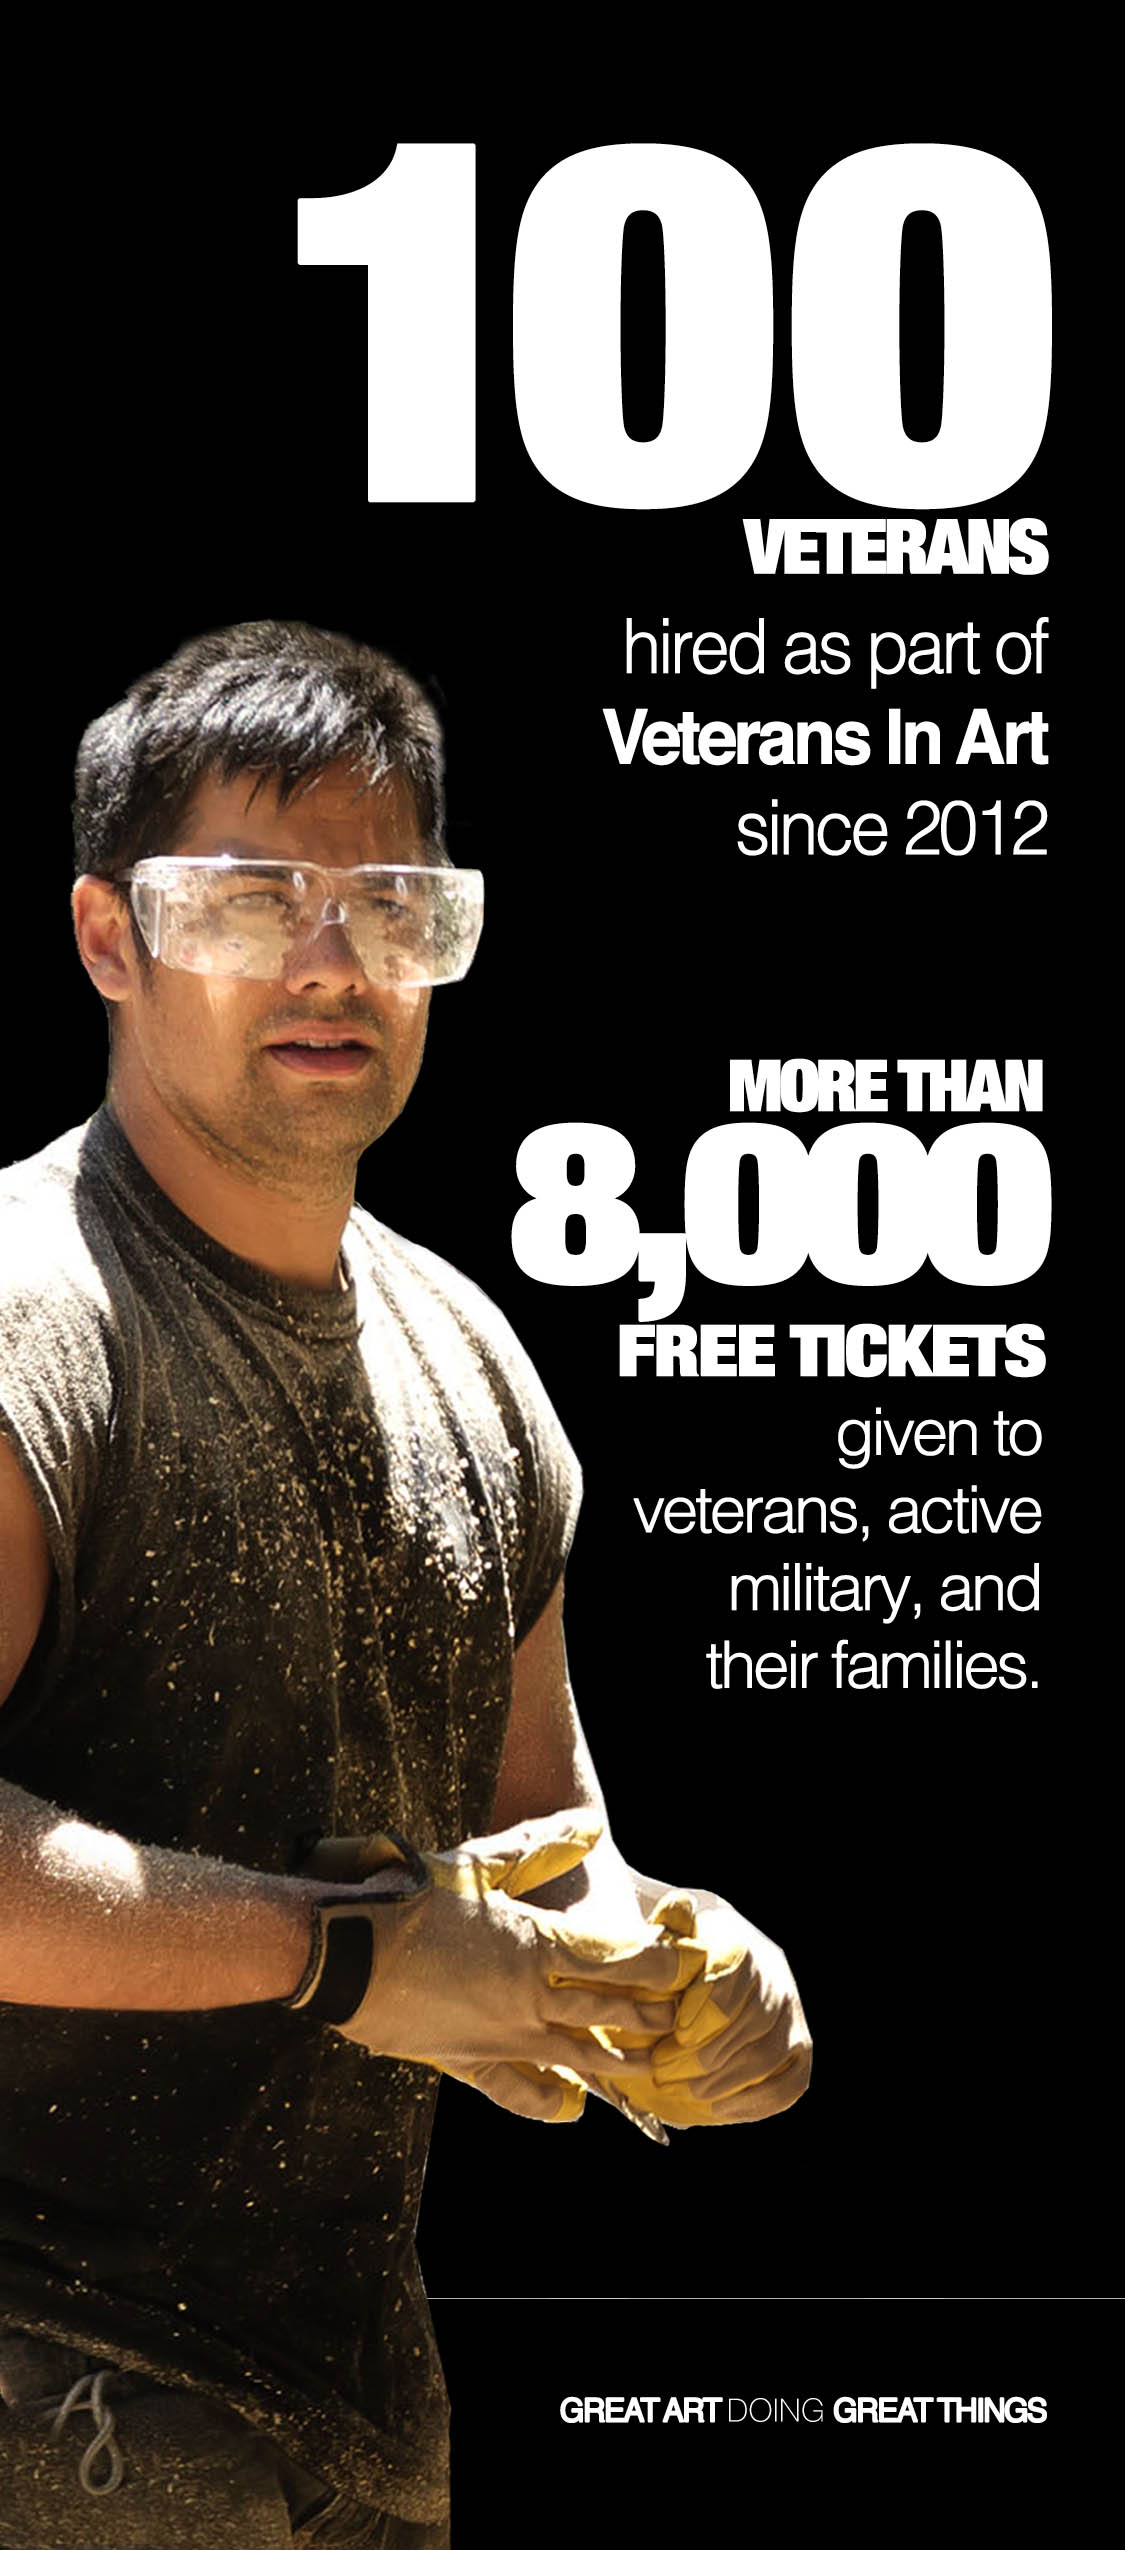 VeteranPostcardFRONT_FINAL.jpg